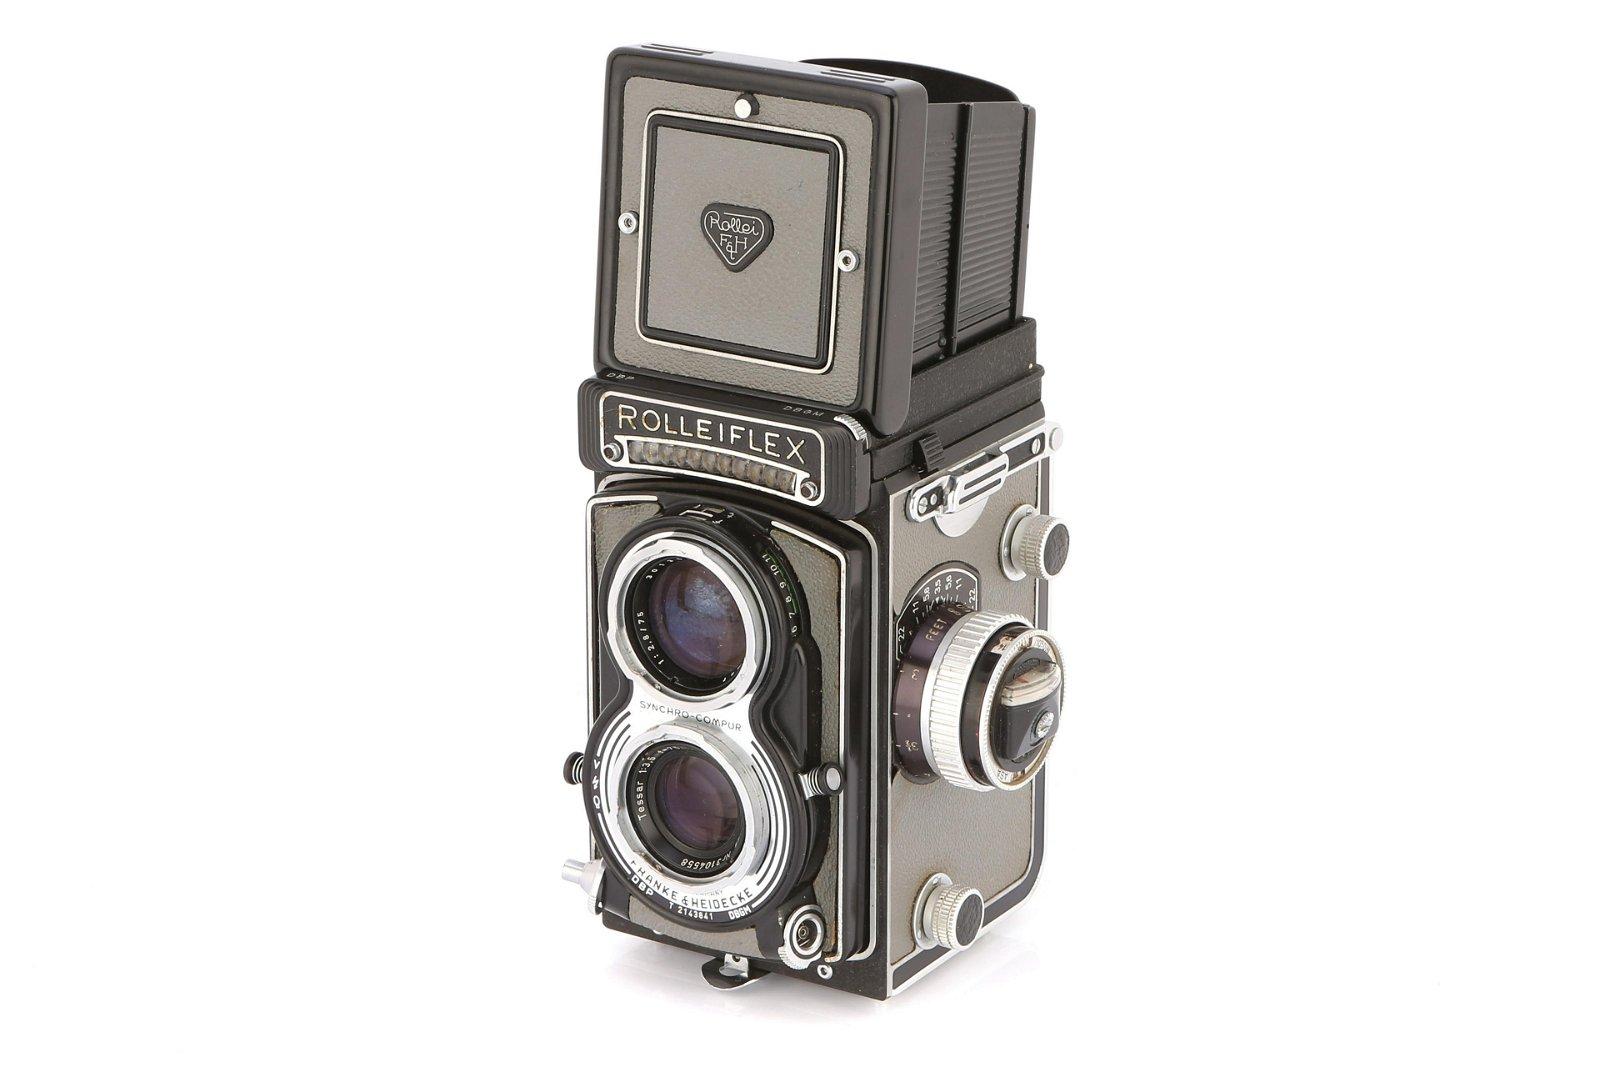 * A Rollei Rolleiflex 3.5T TLR Camera,